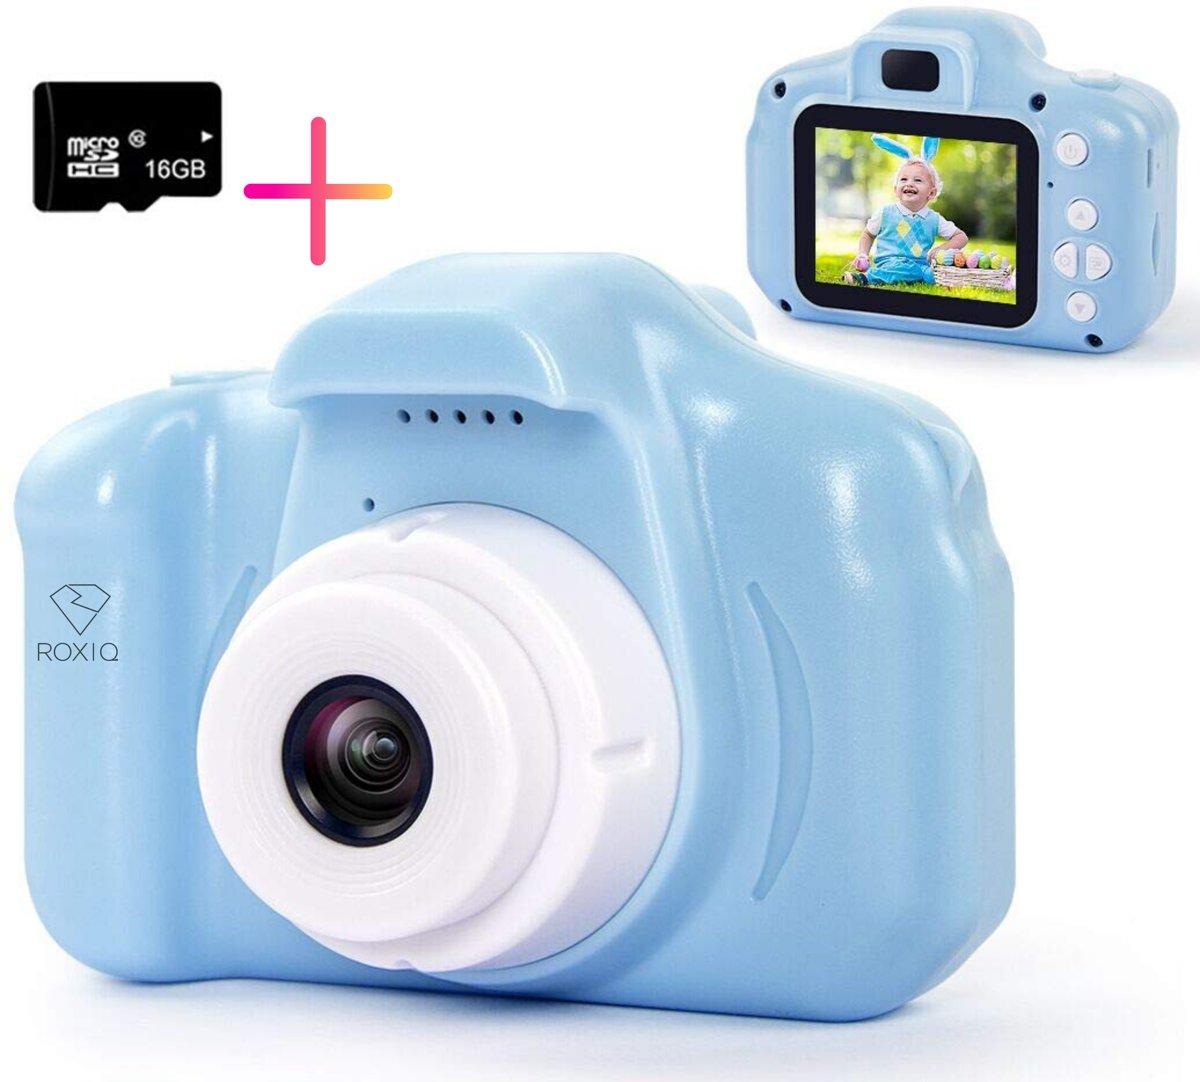 Roxiq kinder camera KC1 blauw � Digitale camera � 1080P HD � Fototoestel voor kinderen